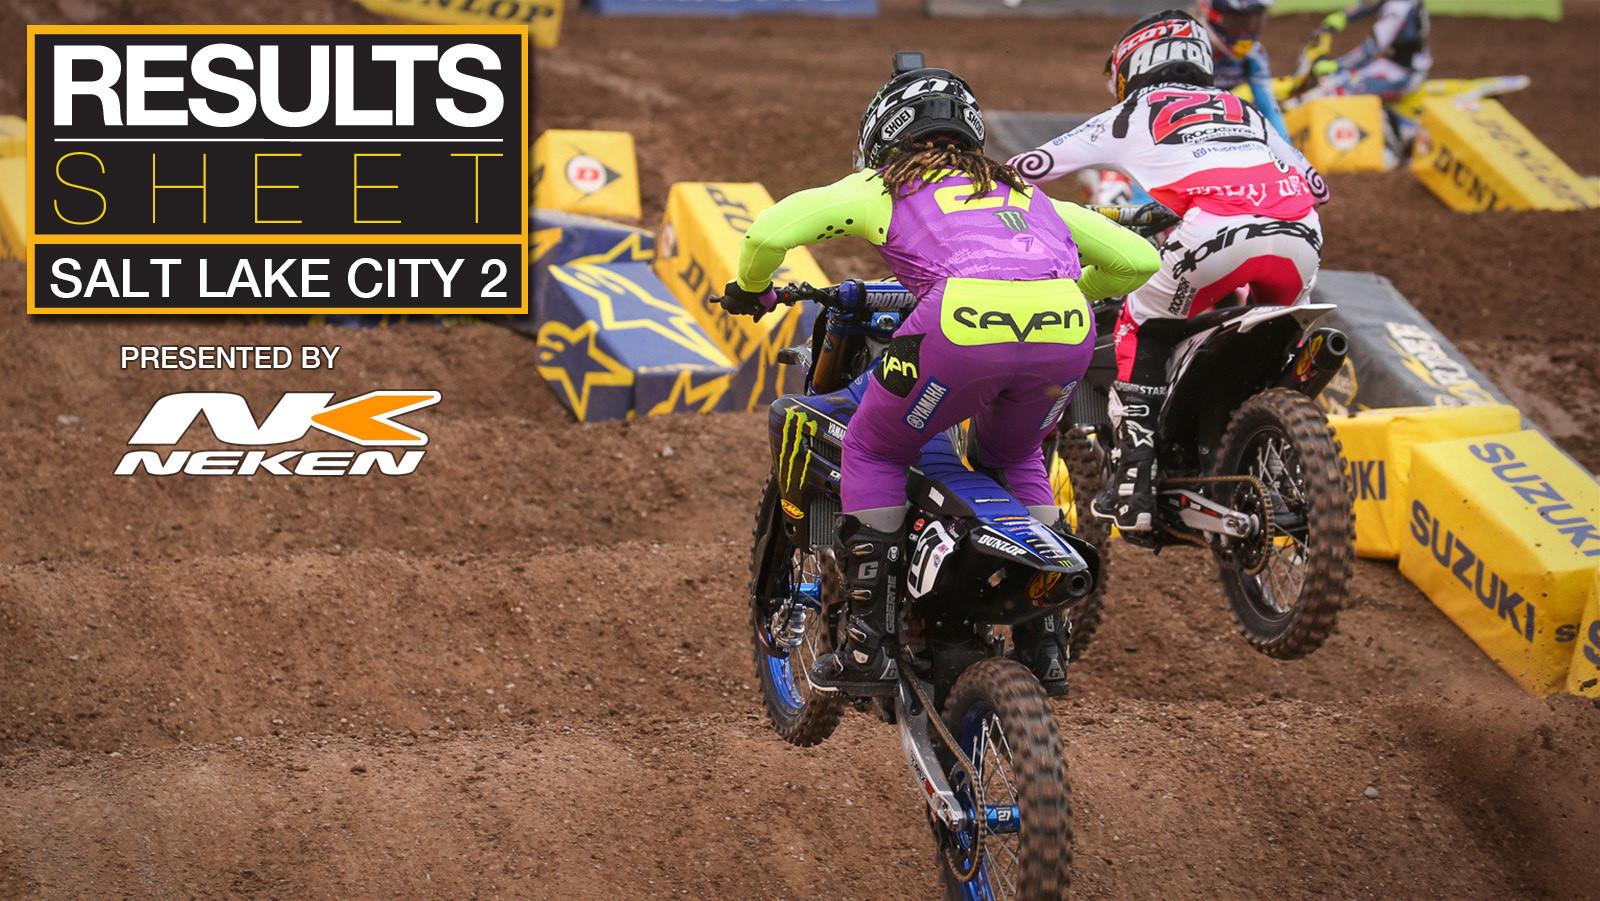 Results Sheet: 2021 Salt Lake City 2 Supercross